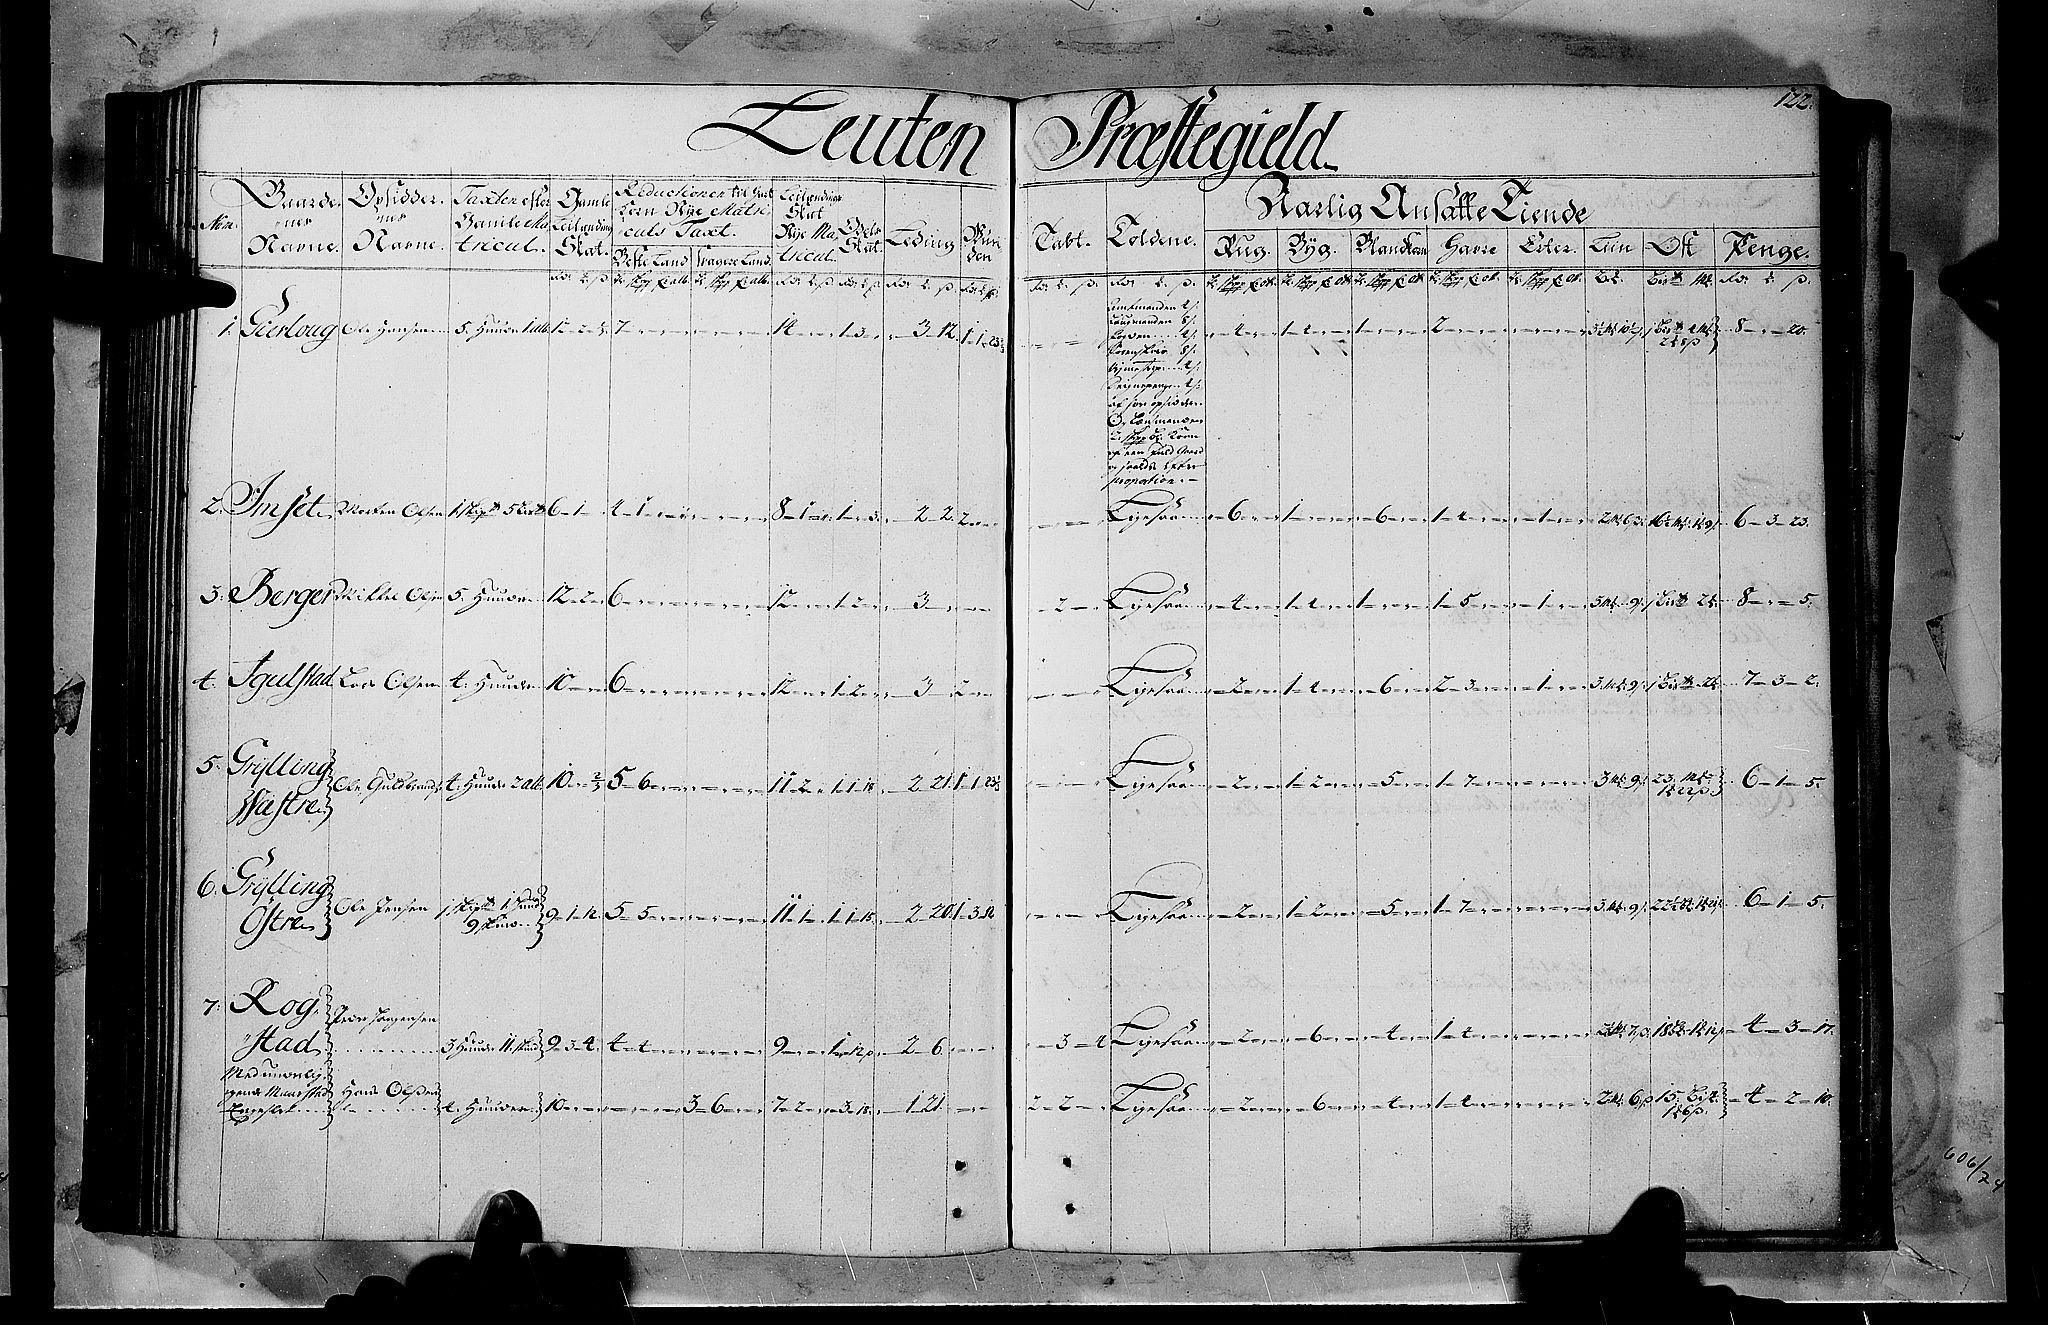 RA, Rentekammeret inntil 1814, Realistisk ordnet avdeling, Fb/L0008b: Ullerål allmenning, 1723, s. 121b-122a